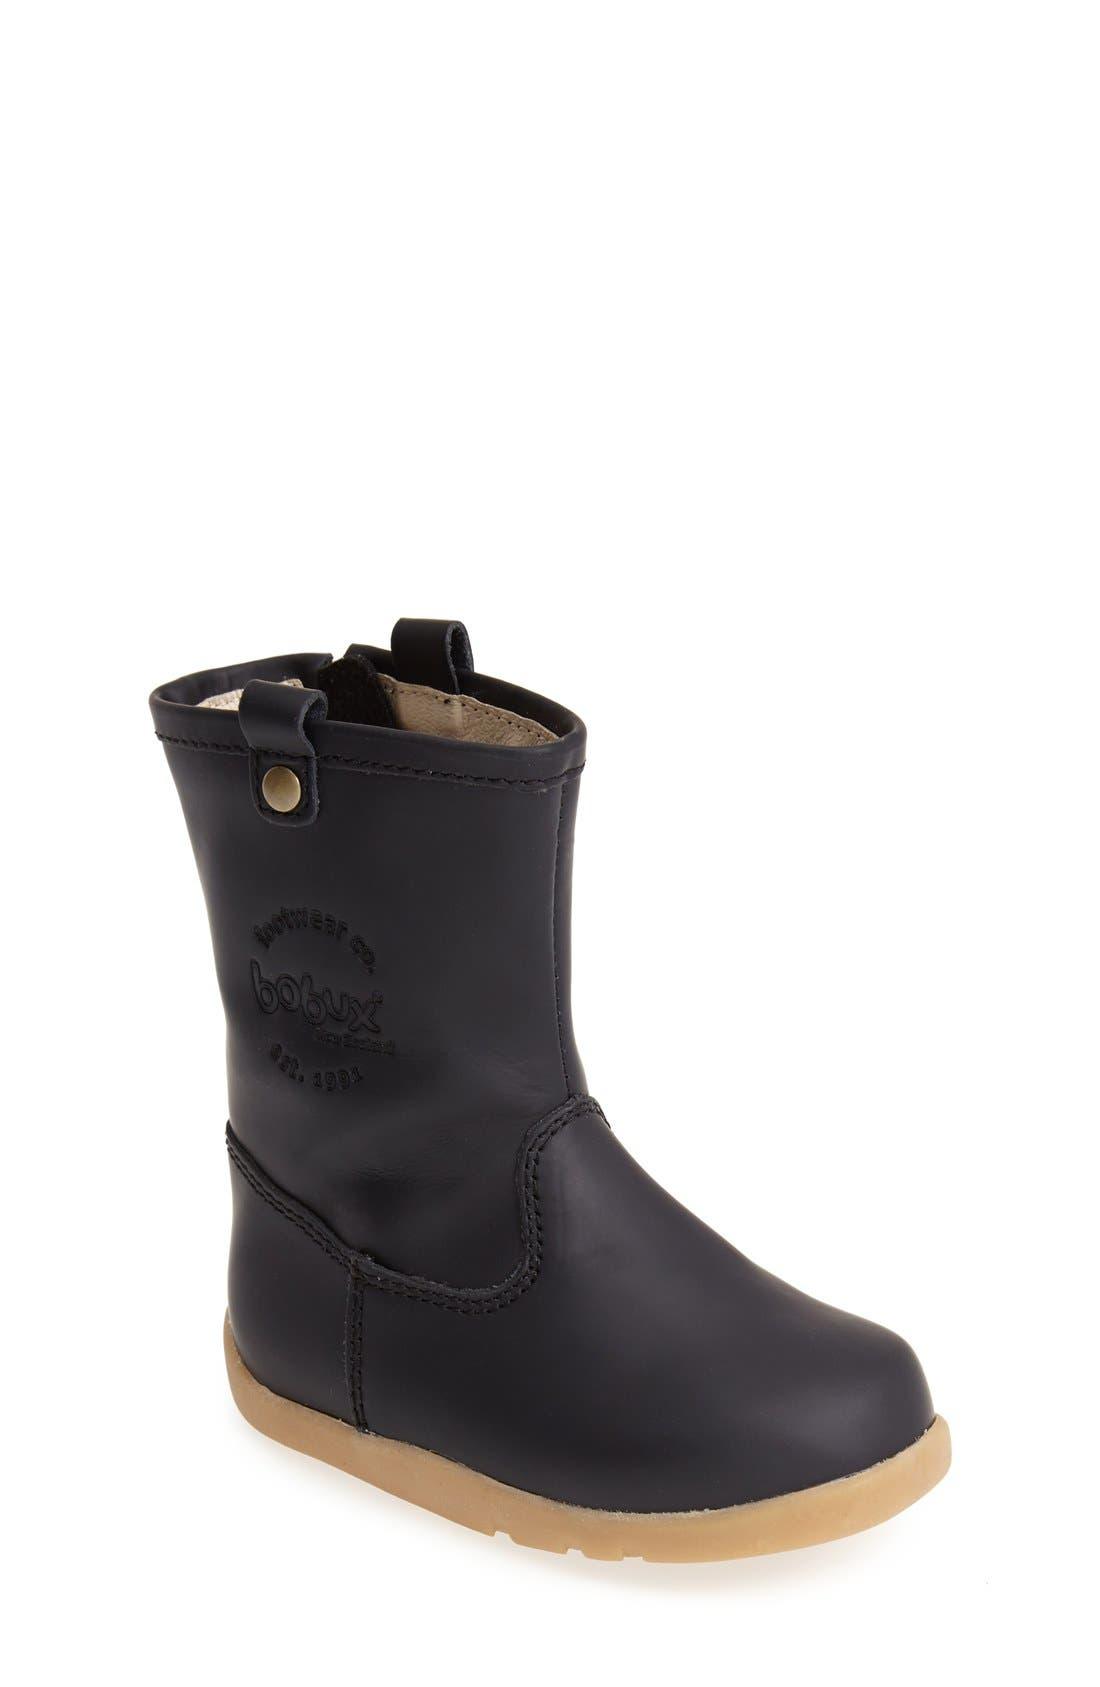 'I-Walk - Splash' Waterproof Rain Boot, Main, color, 001